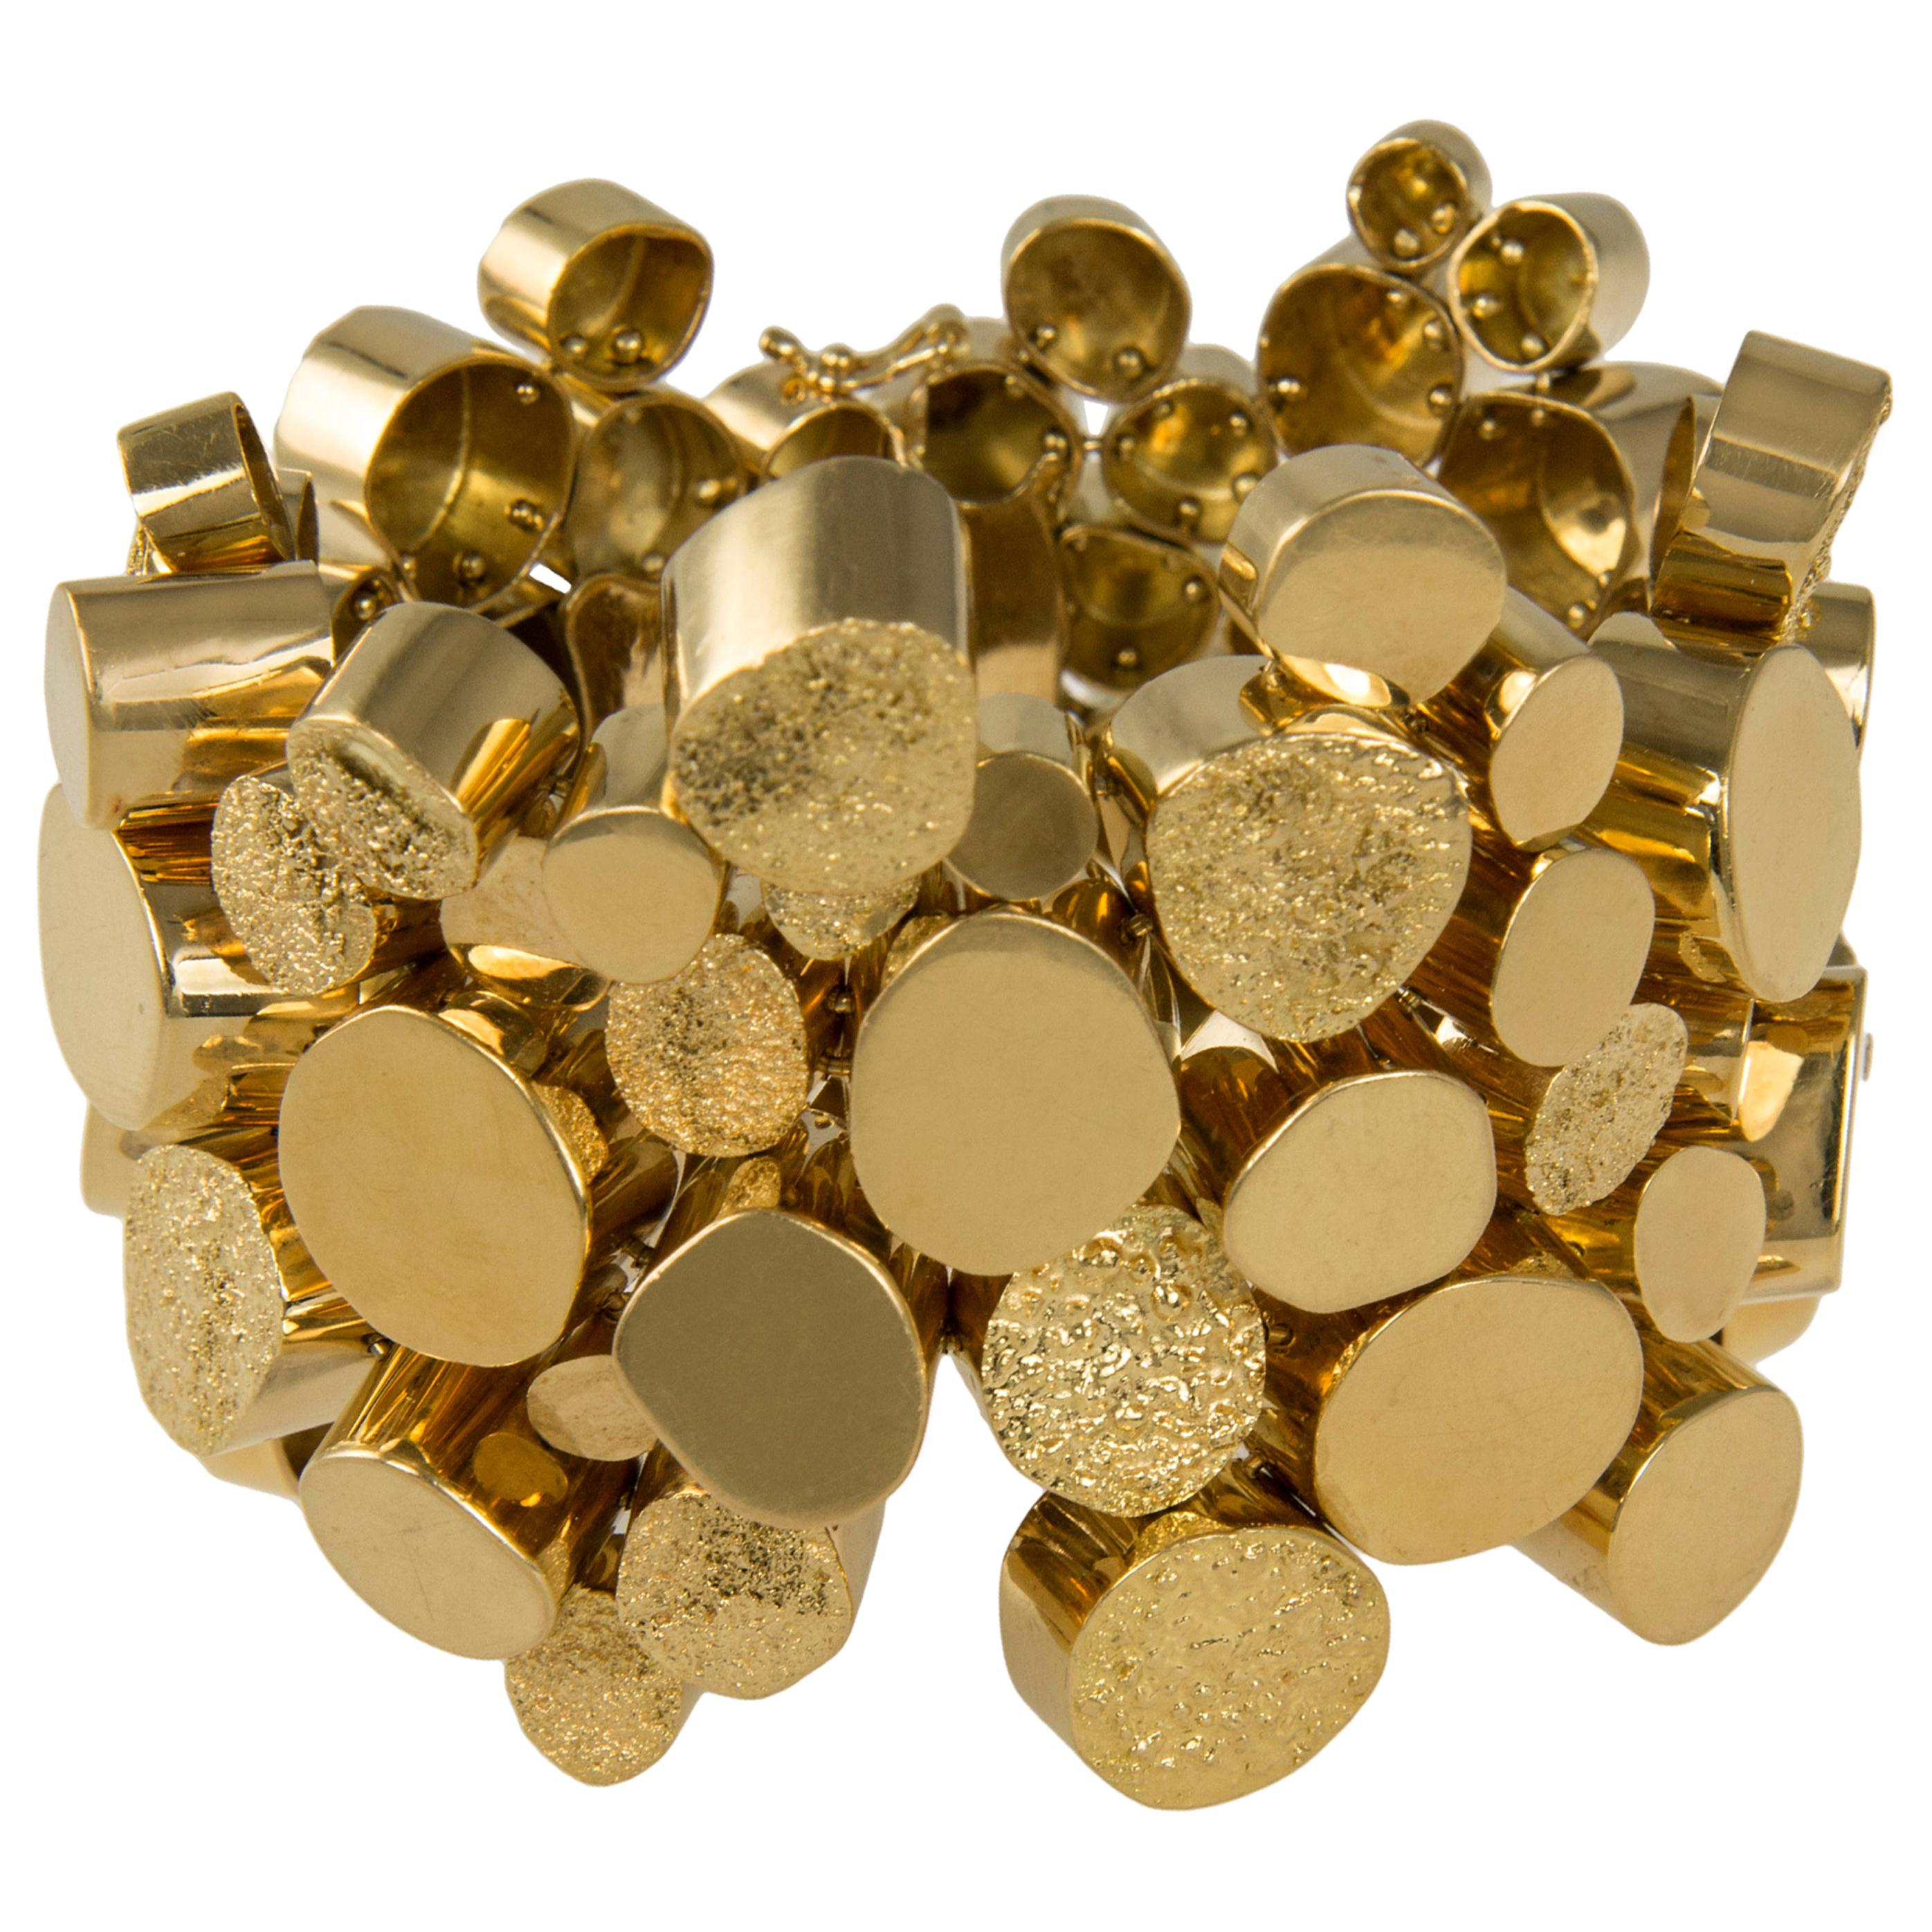 1970s Handmade Textured and Polished Gold Bracelet